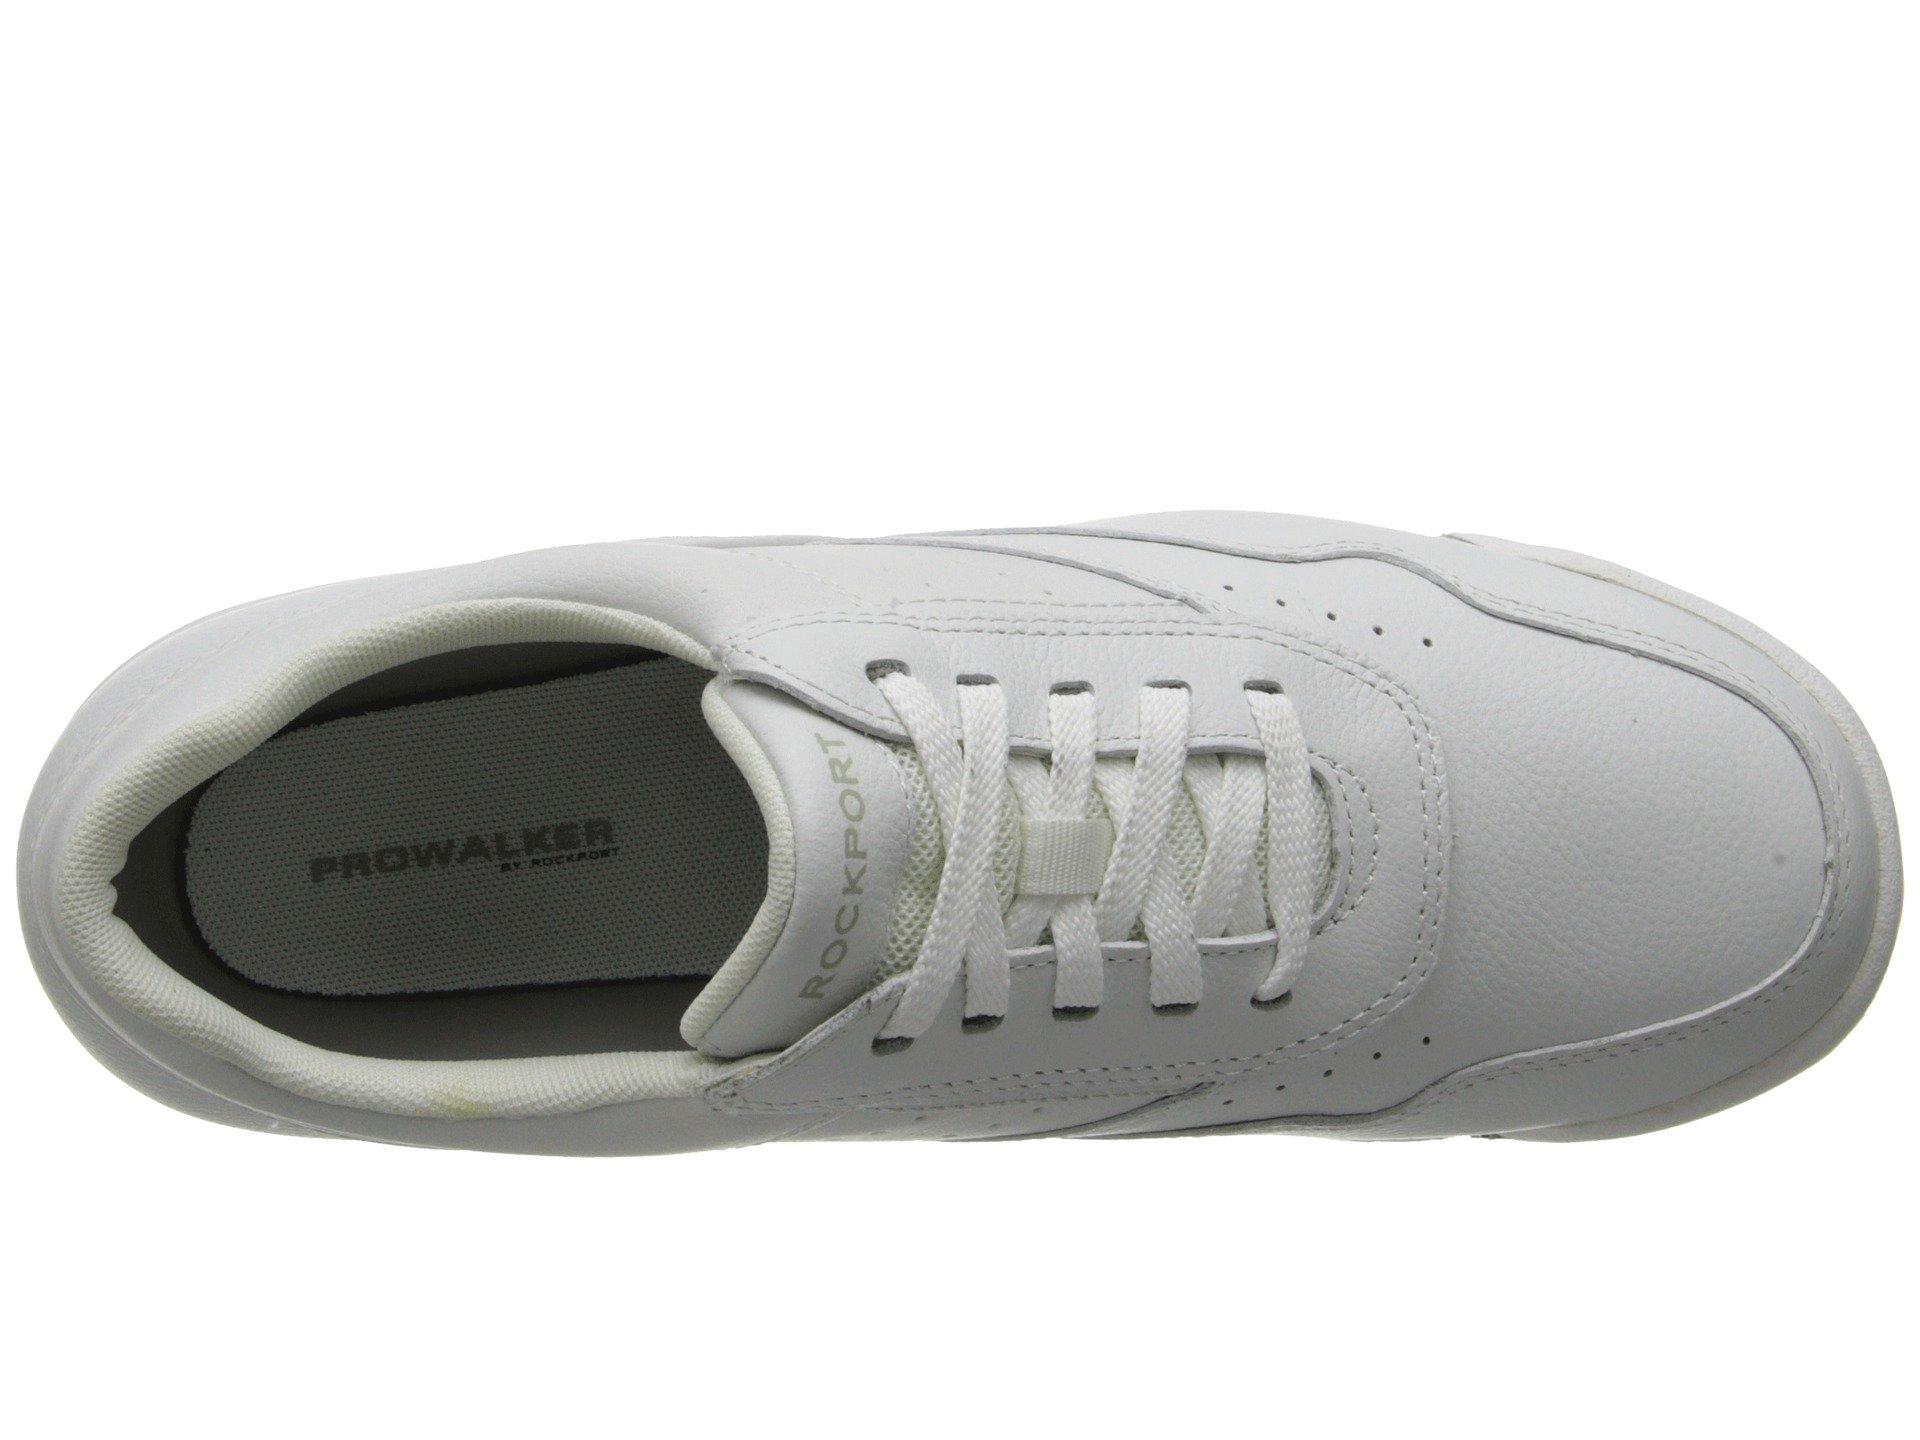 White M7100 Rockport Rockport M7100 Prowalker Prowalker White PwYqaYd